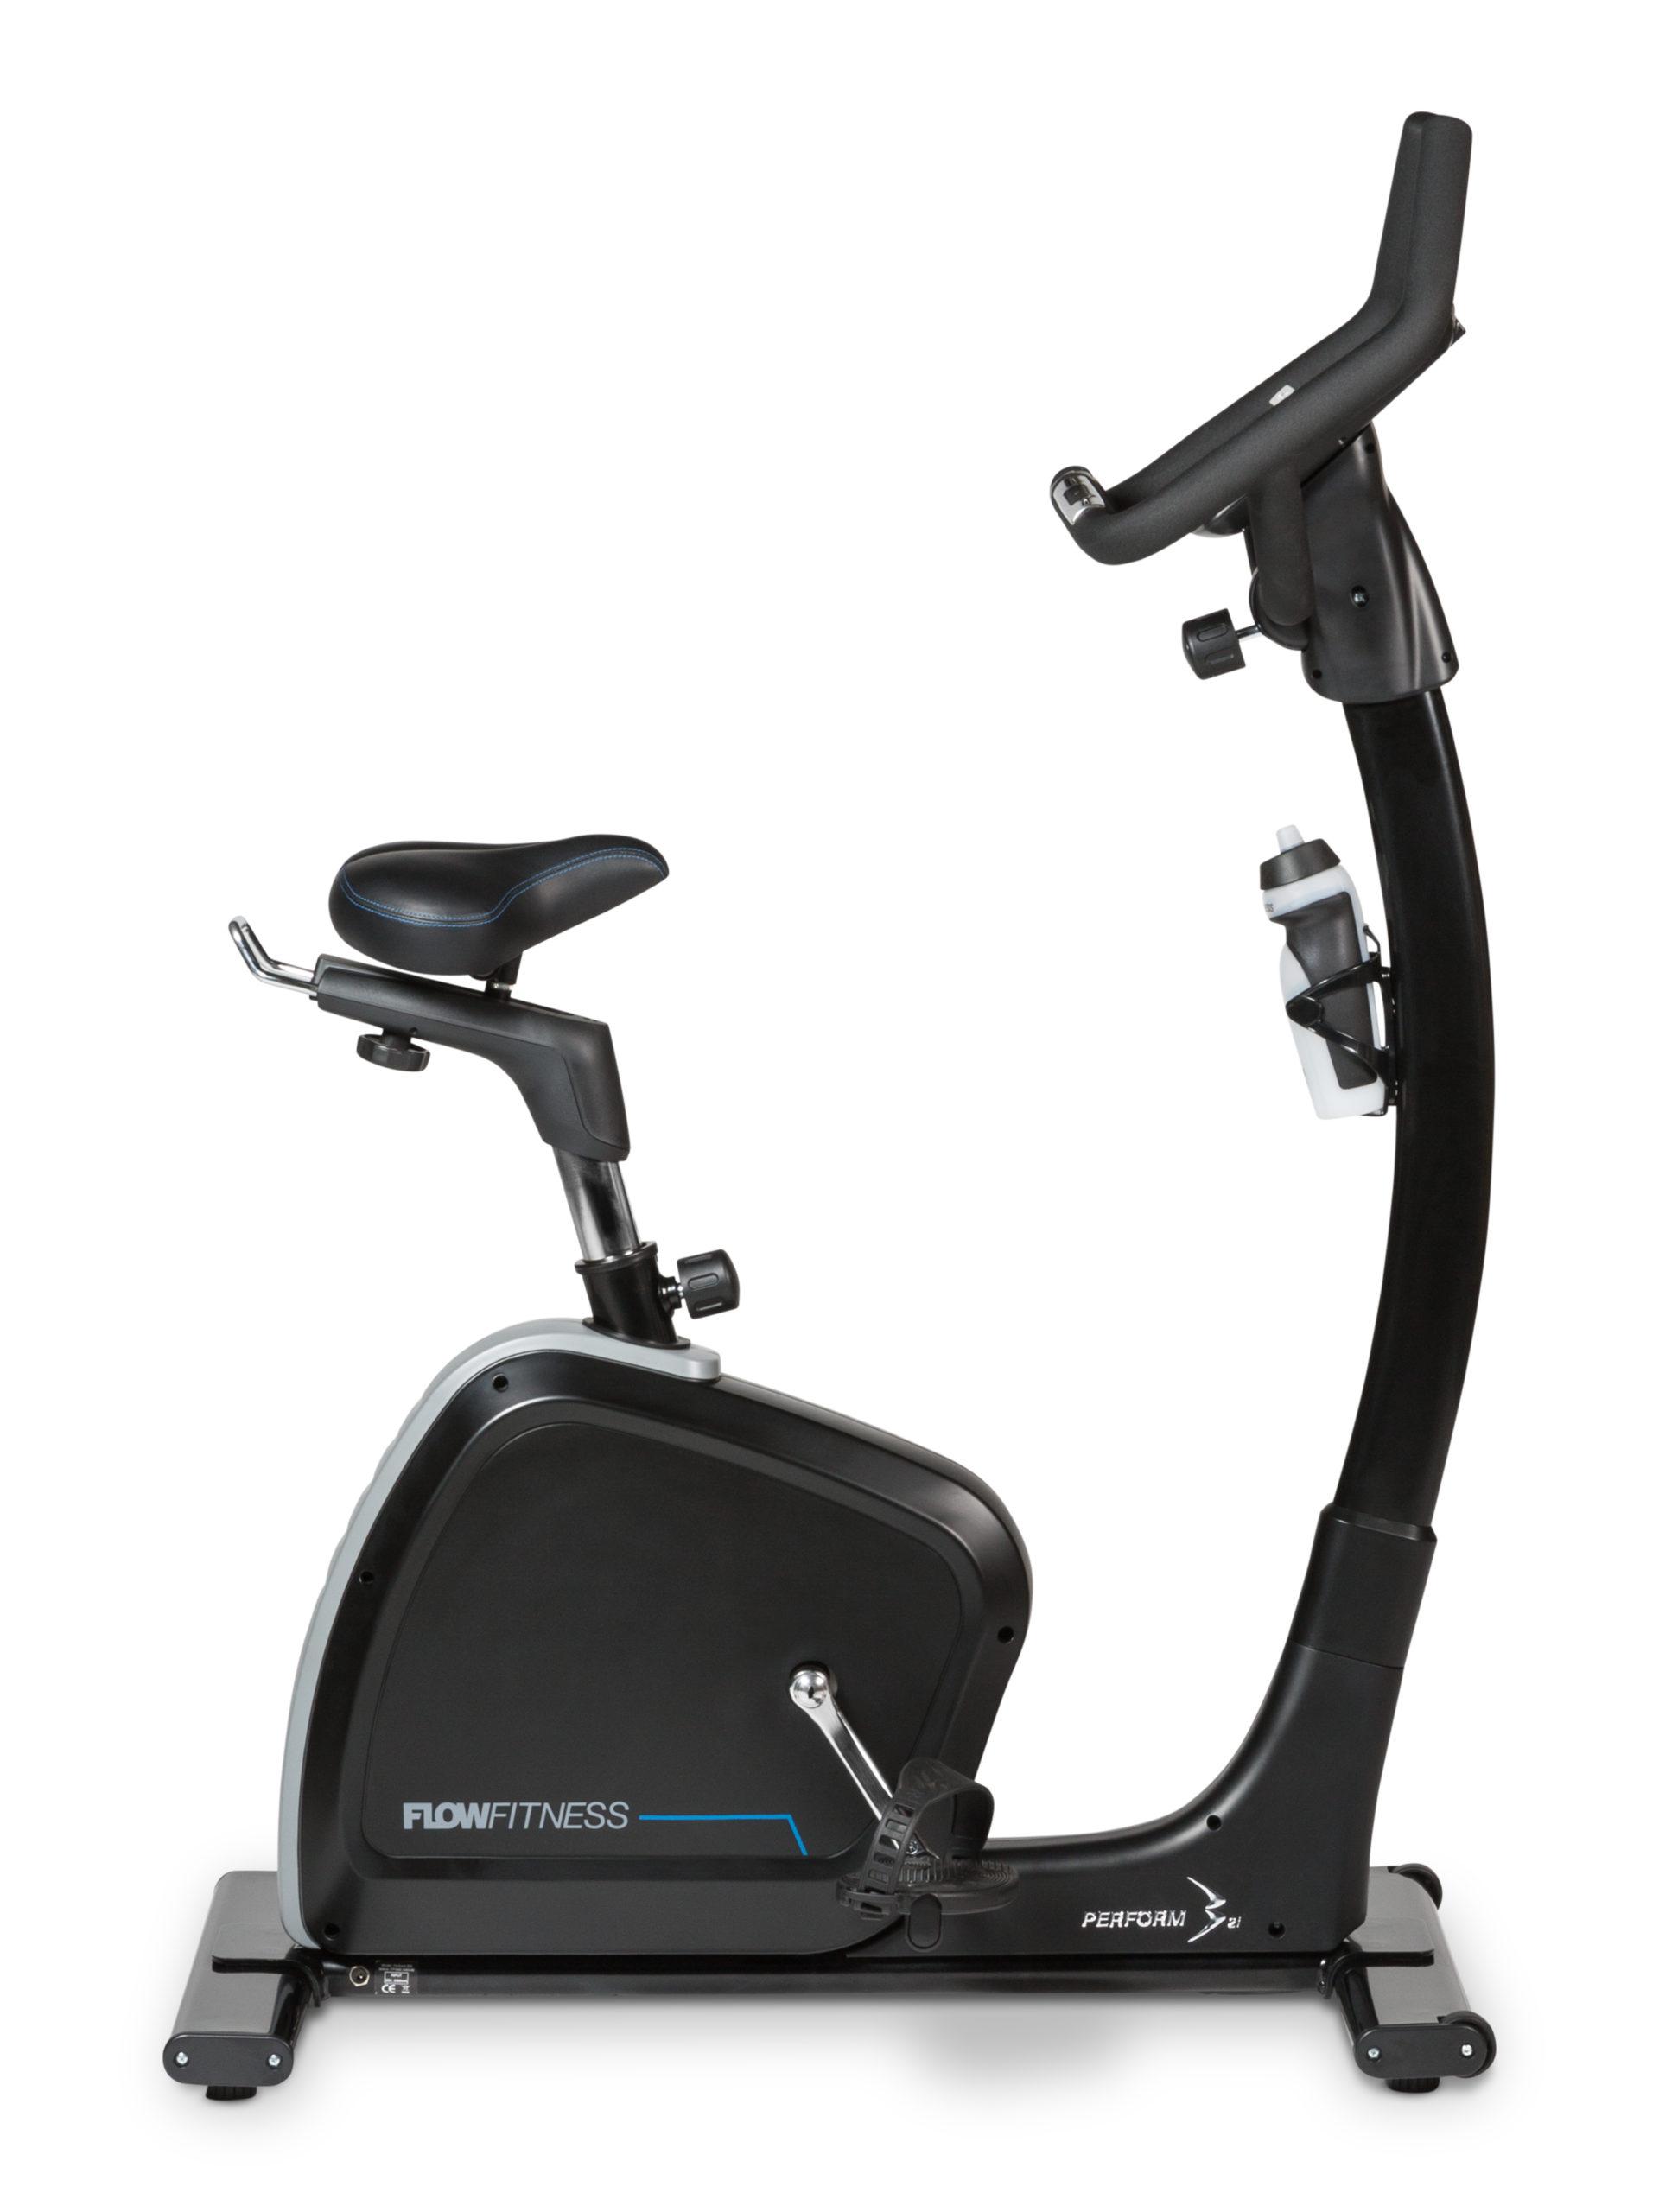 Flow Fitness Tabel PERFORM B2i Ergometer 23